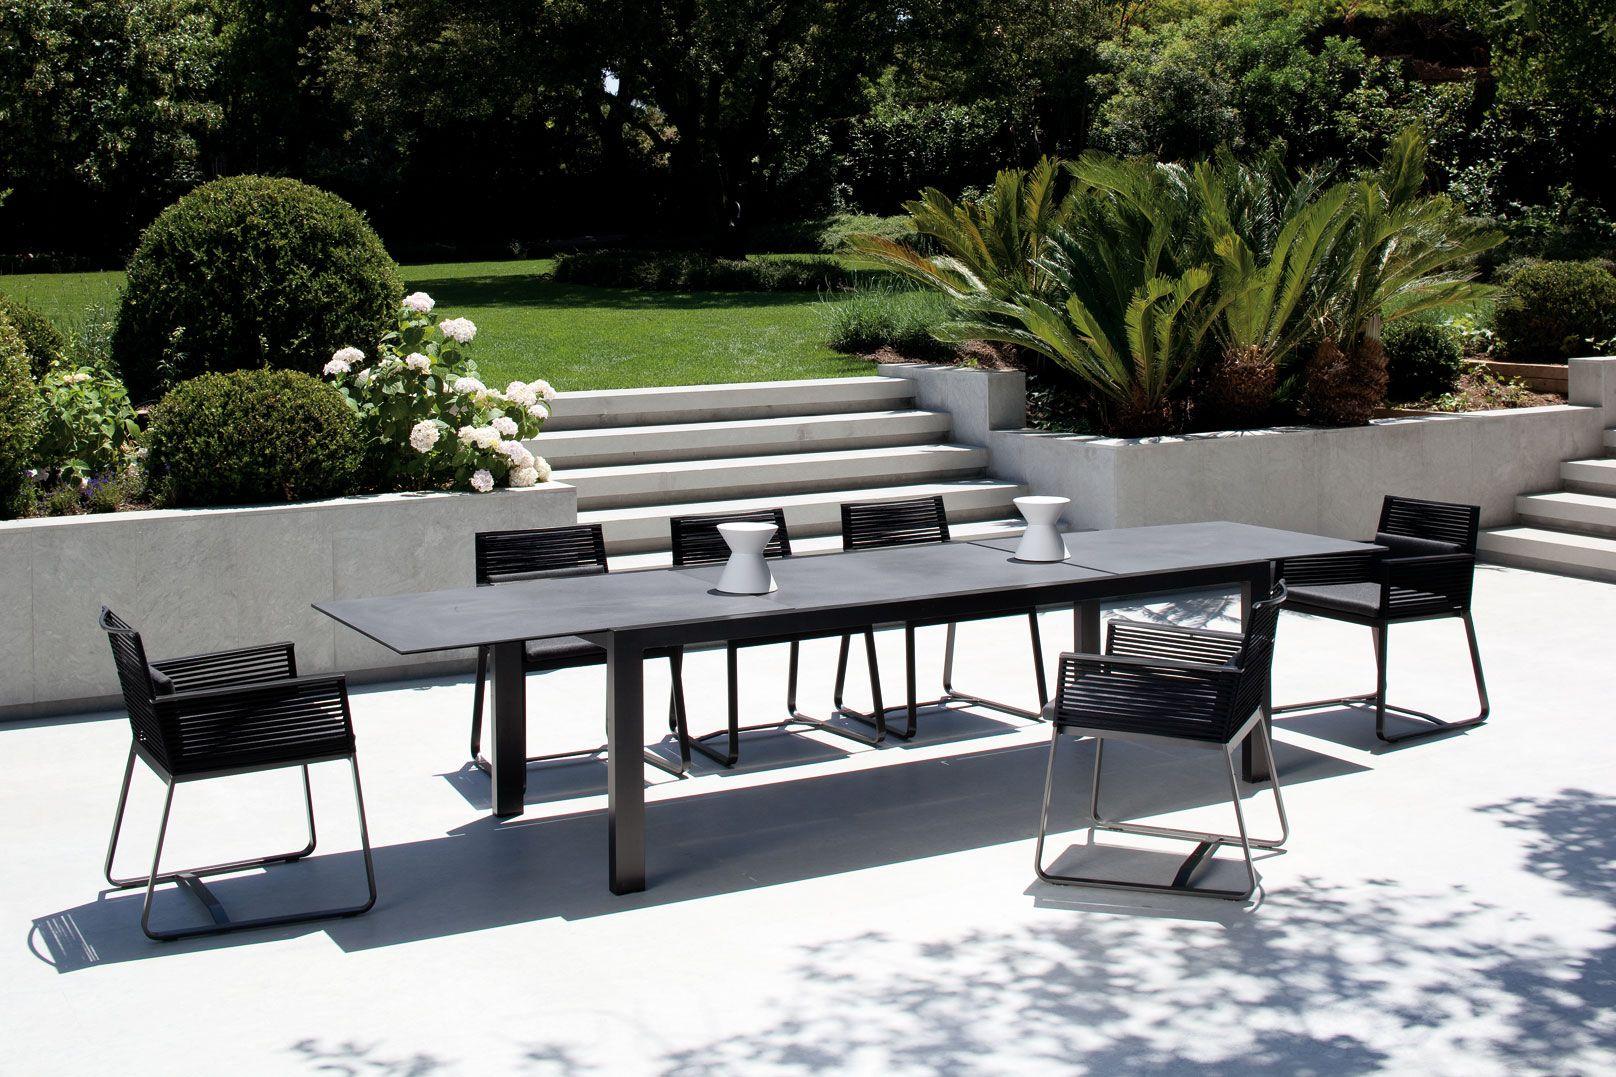 kettal - Google Search | Space-outdoor | Mobilier jardin ...